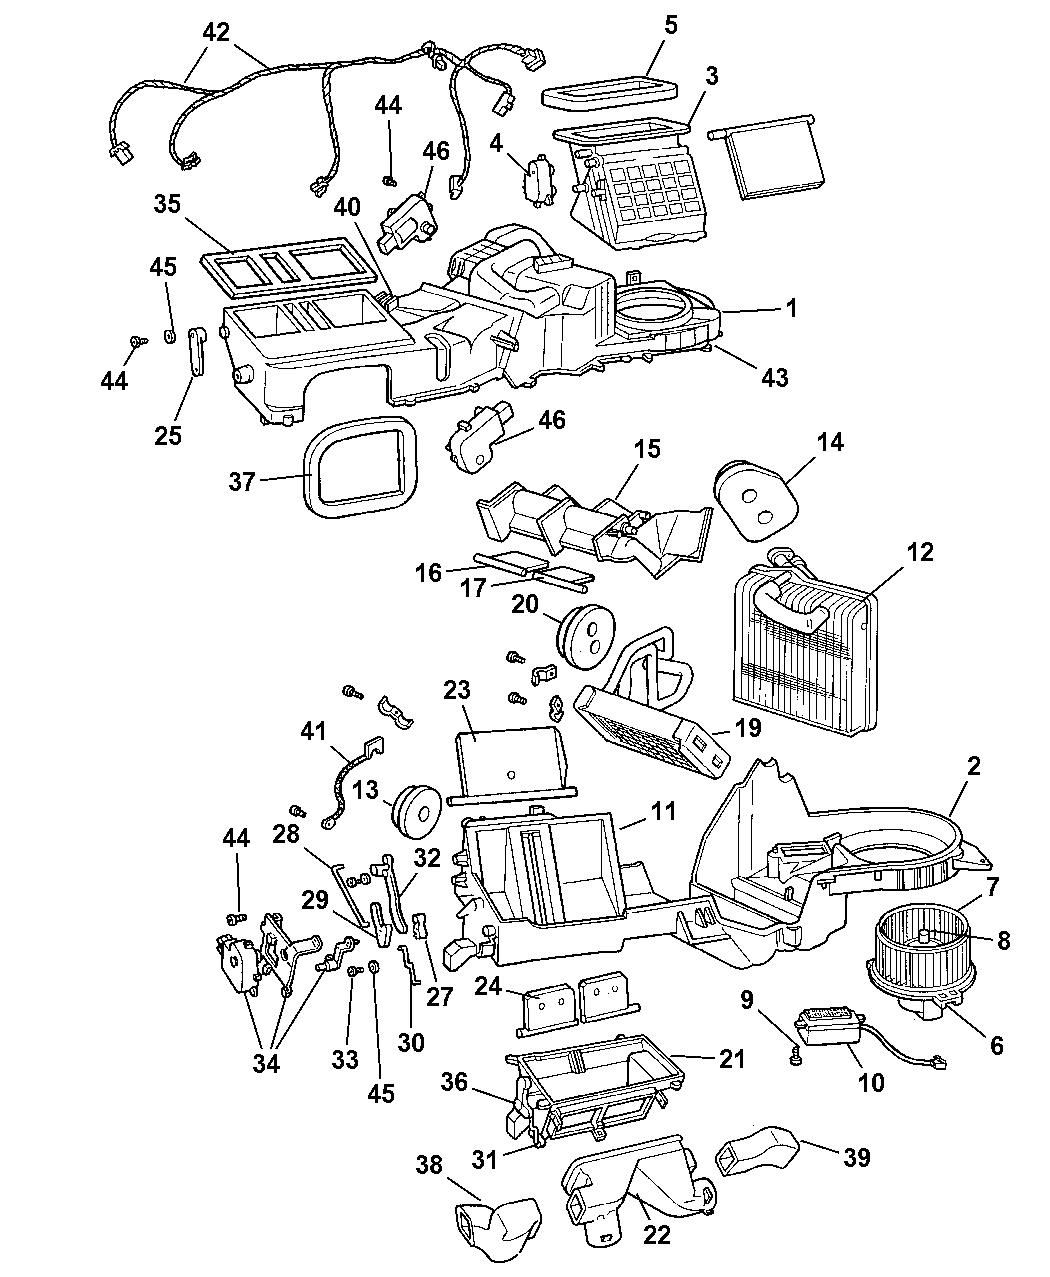 2001 jeep grand cherokee hevac with auto temp control 2001 jeep heater control diagram